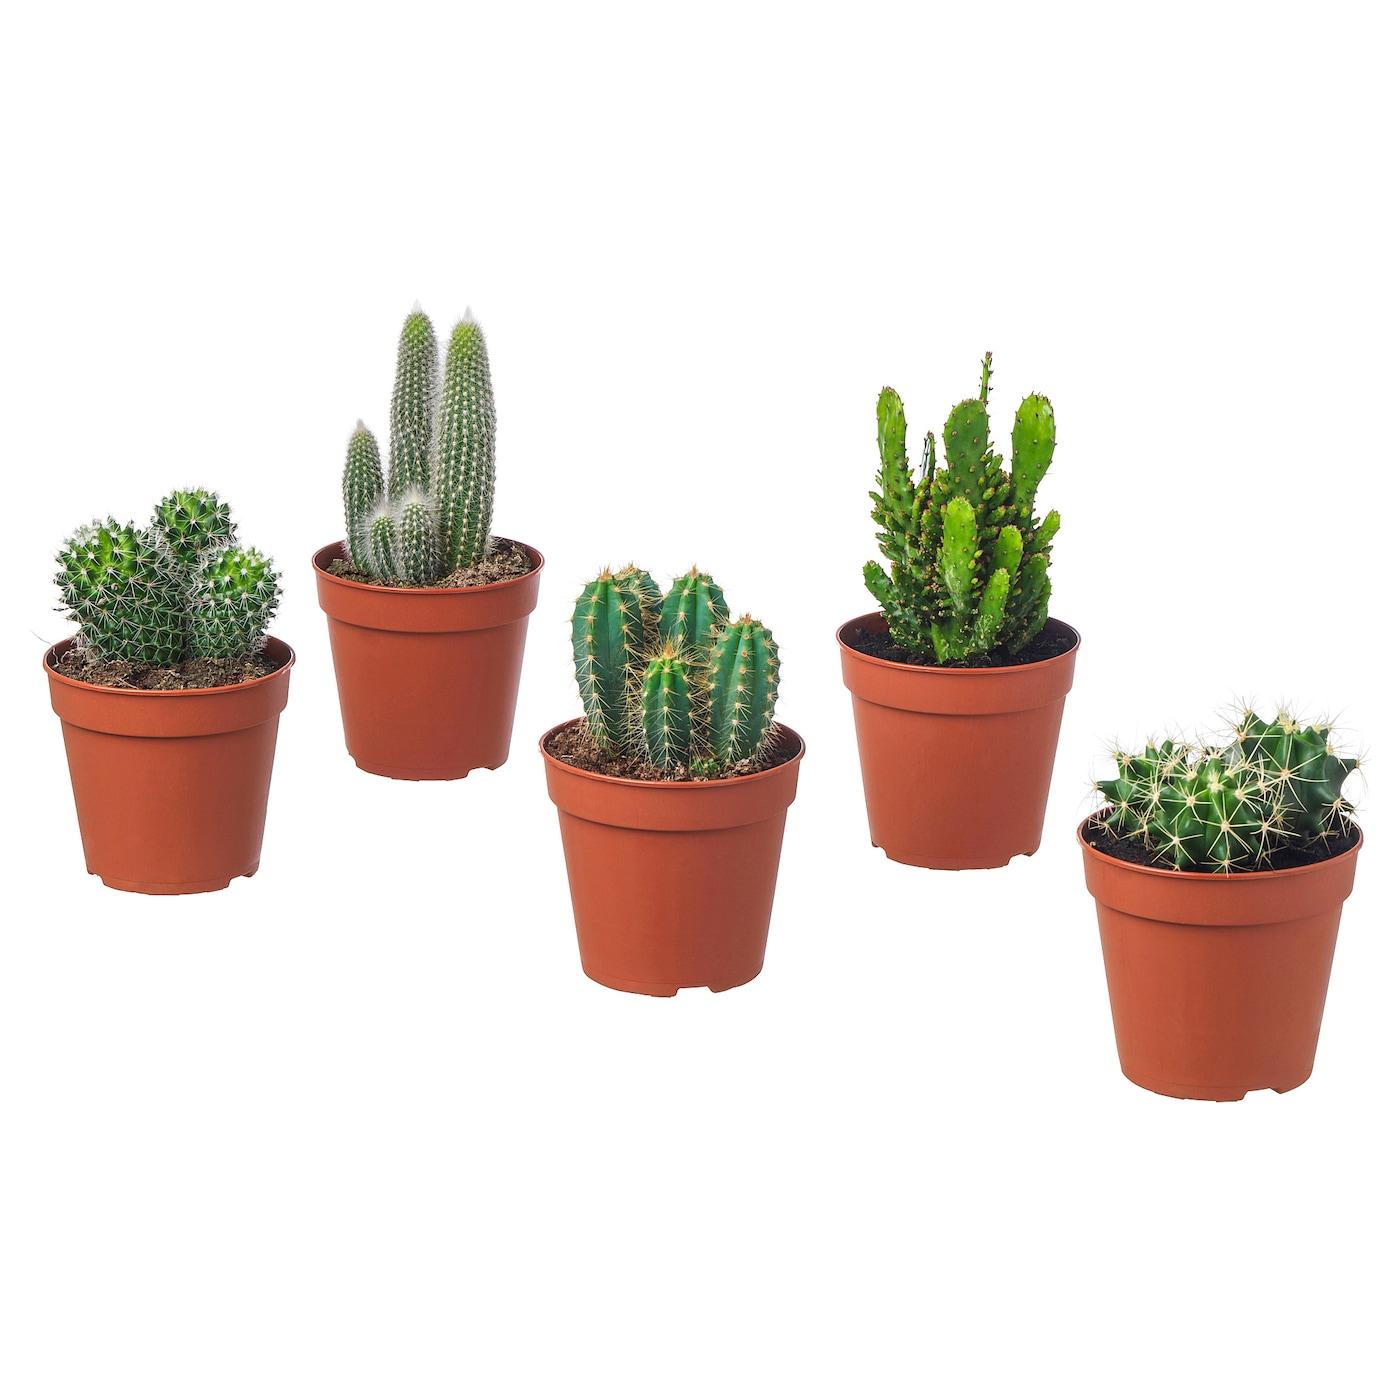 Plantas Naturales Compra Online Ikea